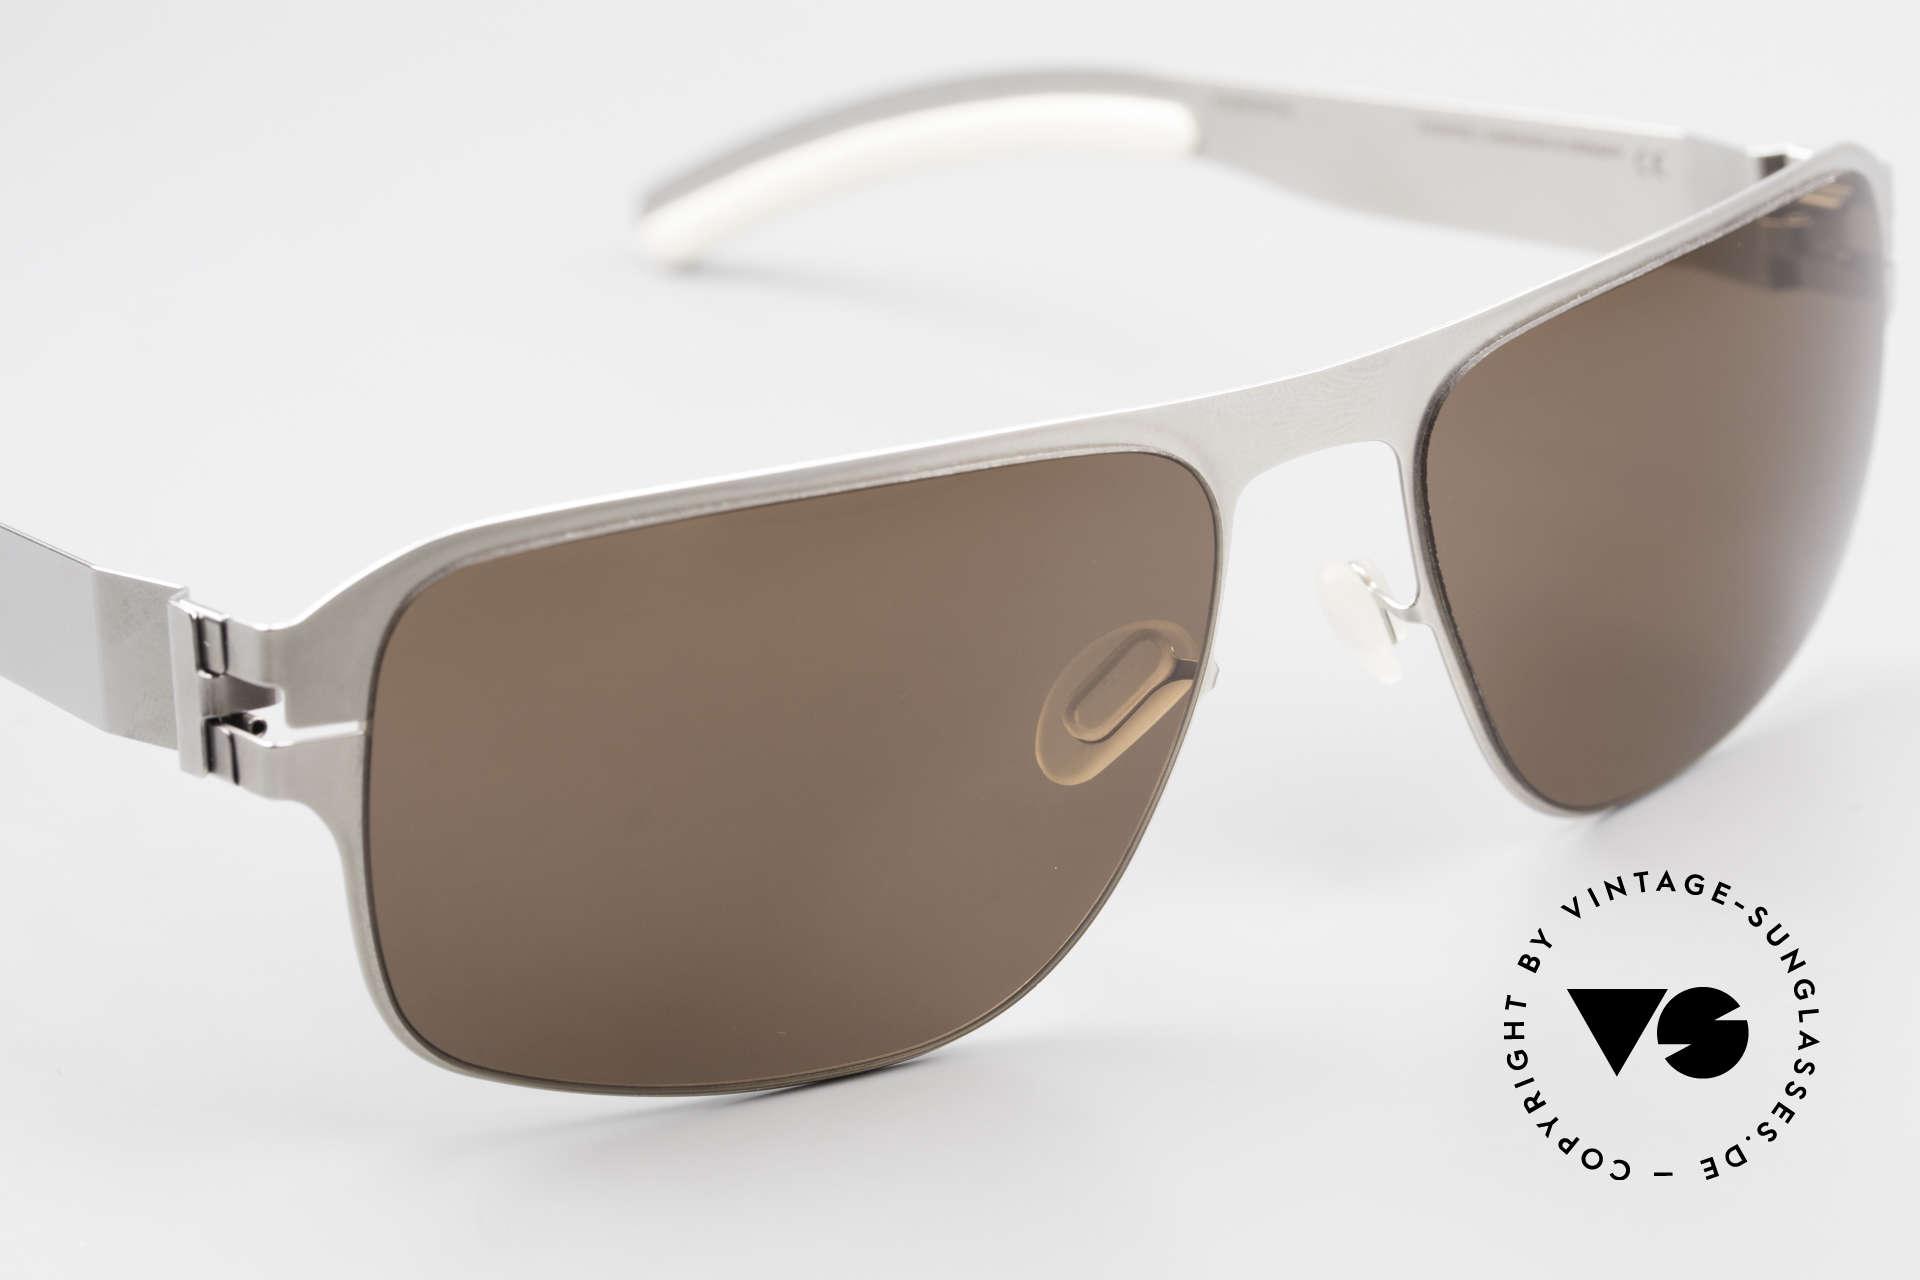 Mykita Lennox Sporty Designer Sunglasses, top-notch quality, made in Germany (Berlin-Kreuzberg), Made for Men